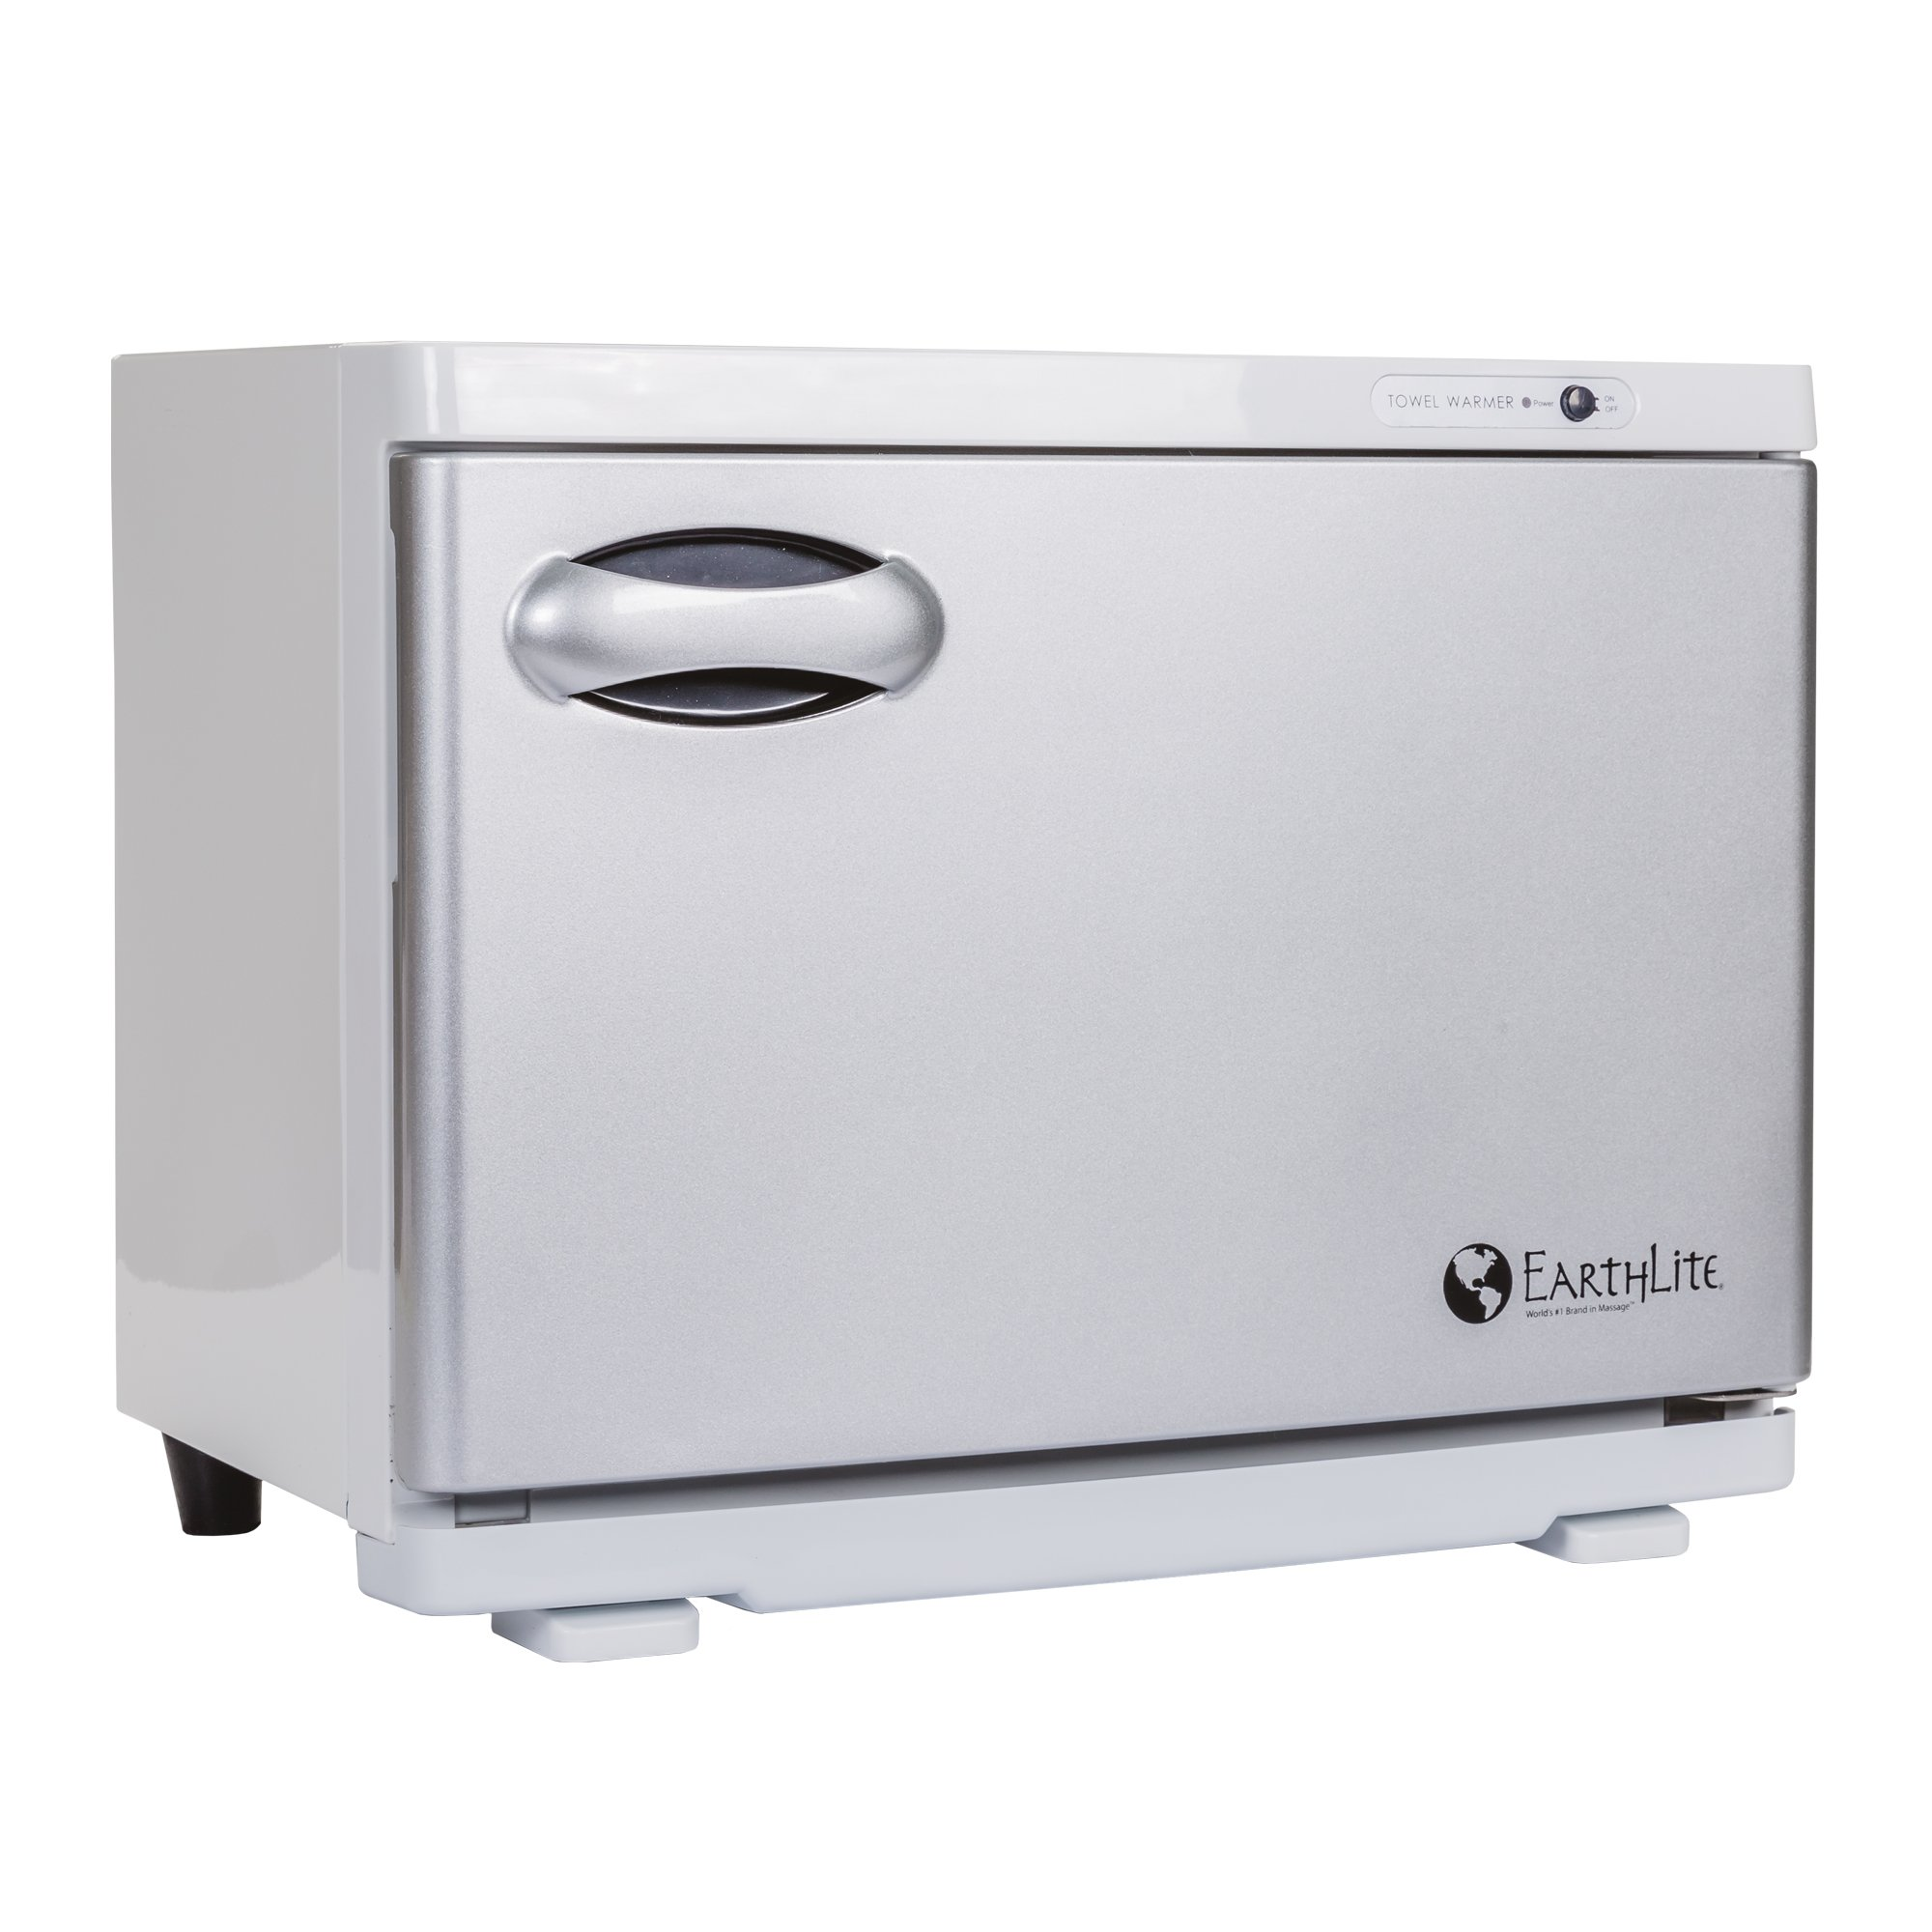 EARTHLITE Hot Towel Warmer Cabinet - UV Sanitizing, UL Listed, Rust Proof Interior, Aluminum Door, Extra Hot, 1 Year Warranty (18L)